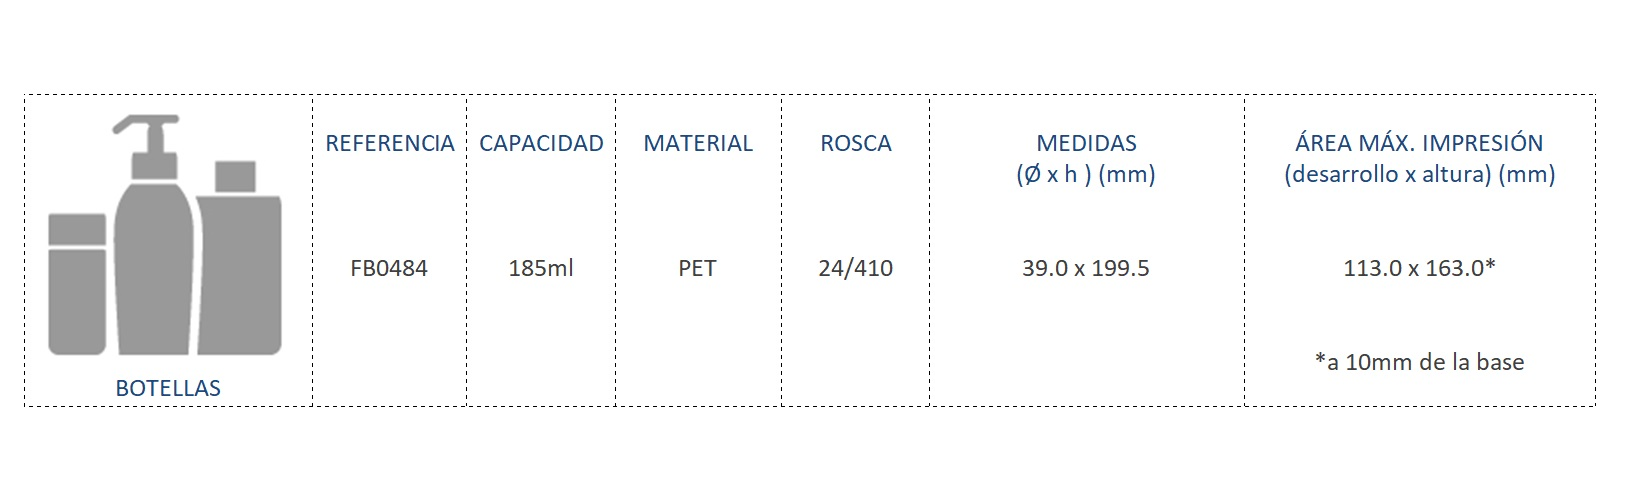 Cuadro de materiales botella FB0484